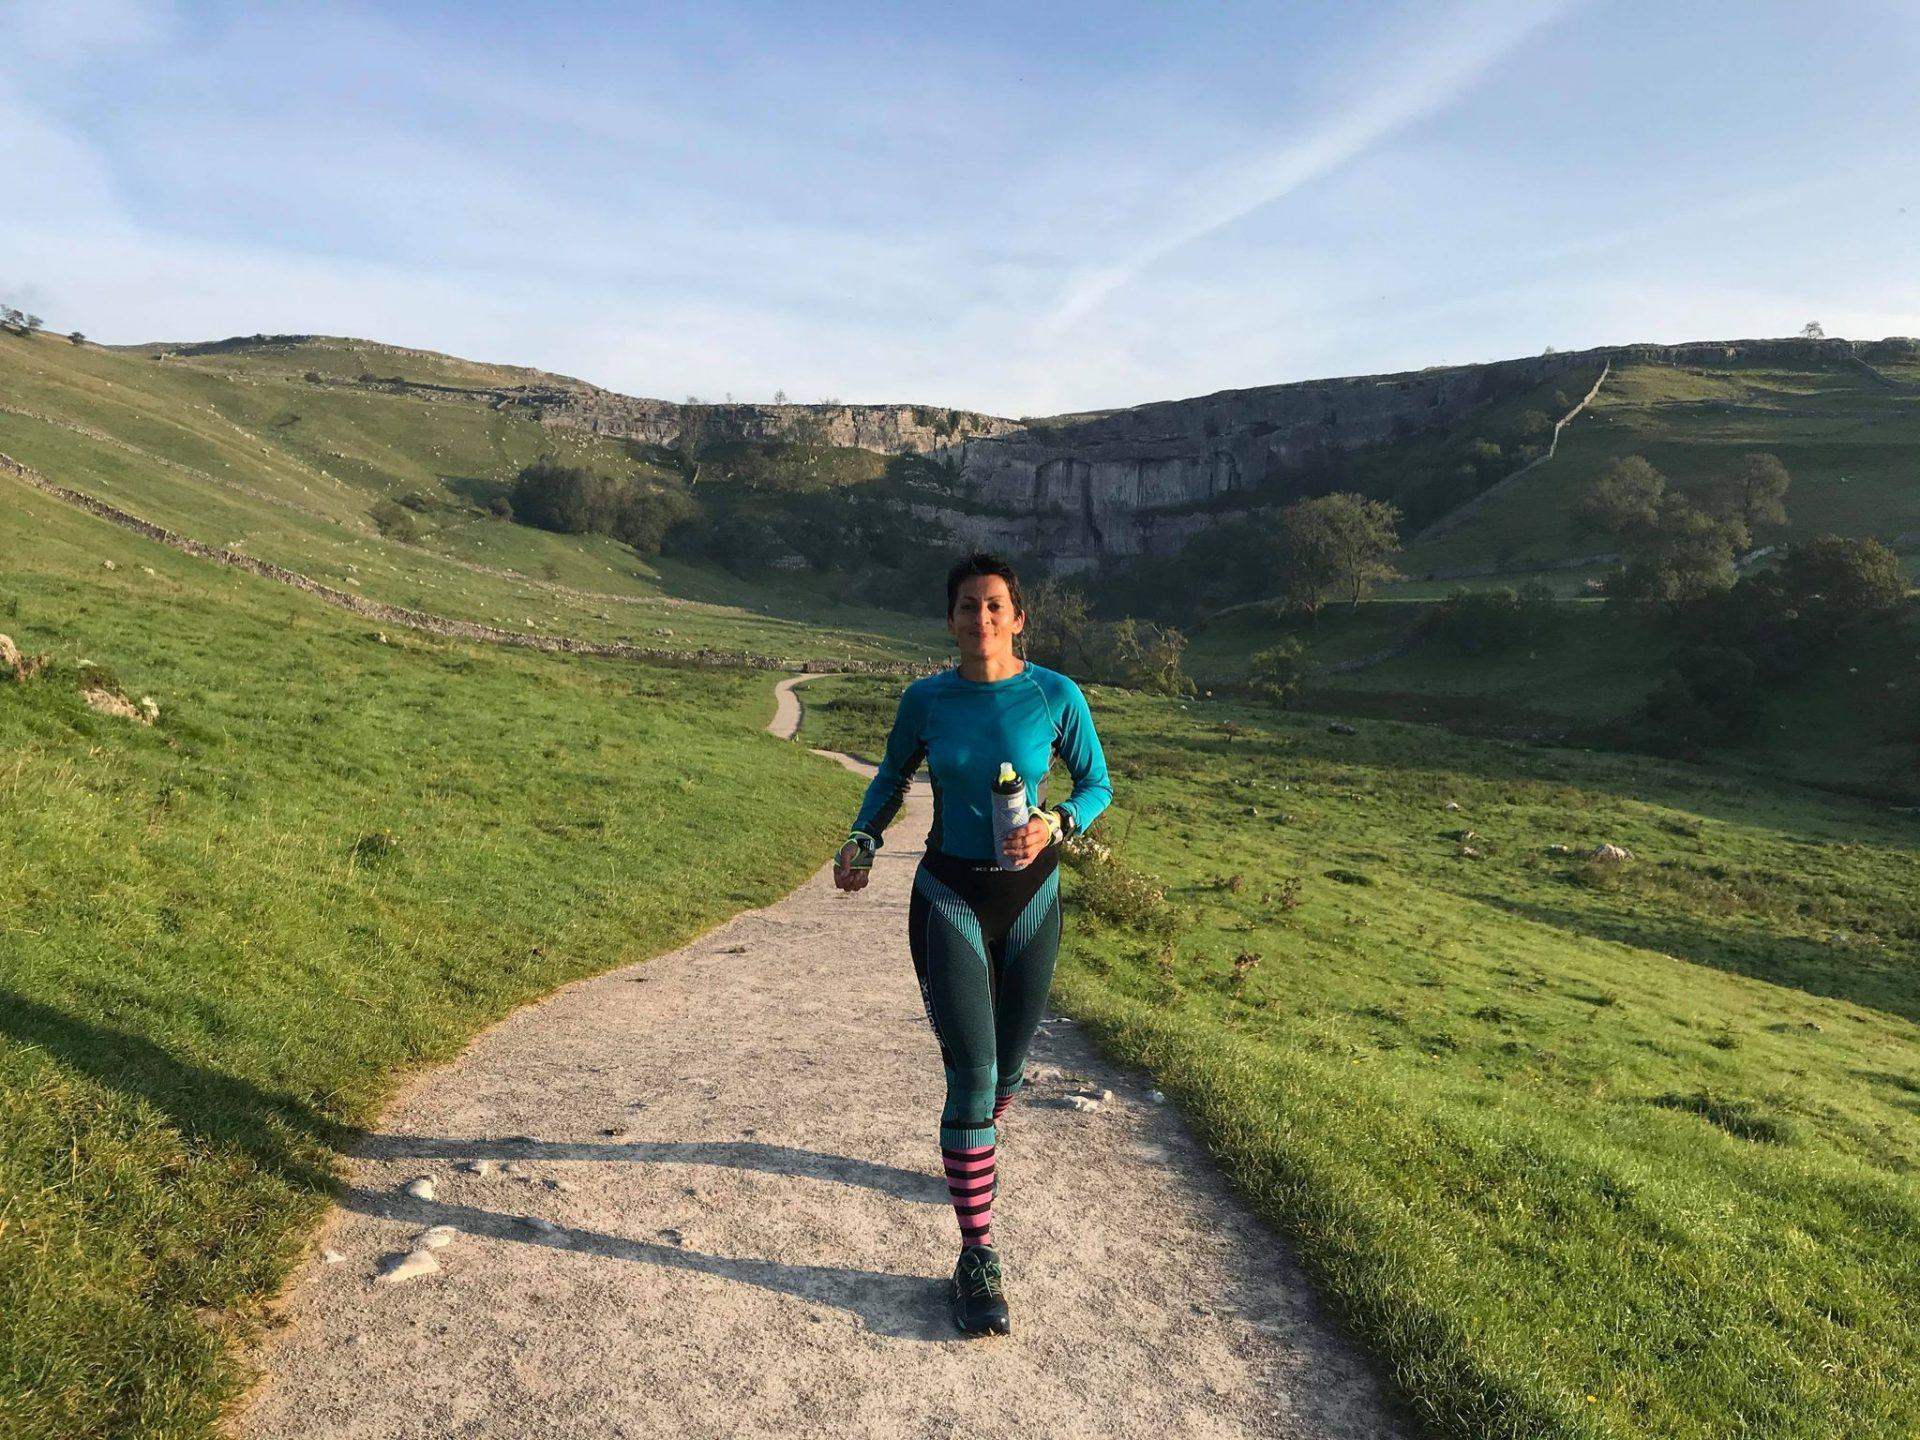 Sabrina Verjee's record run on the Pennine Way.